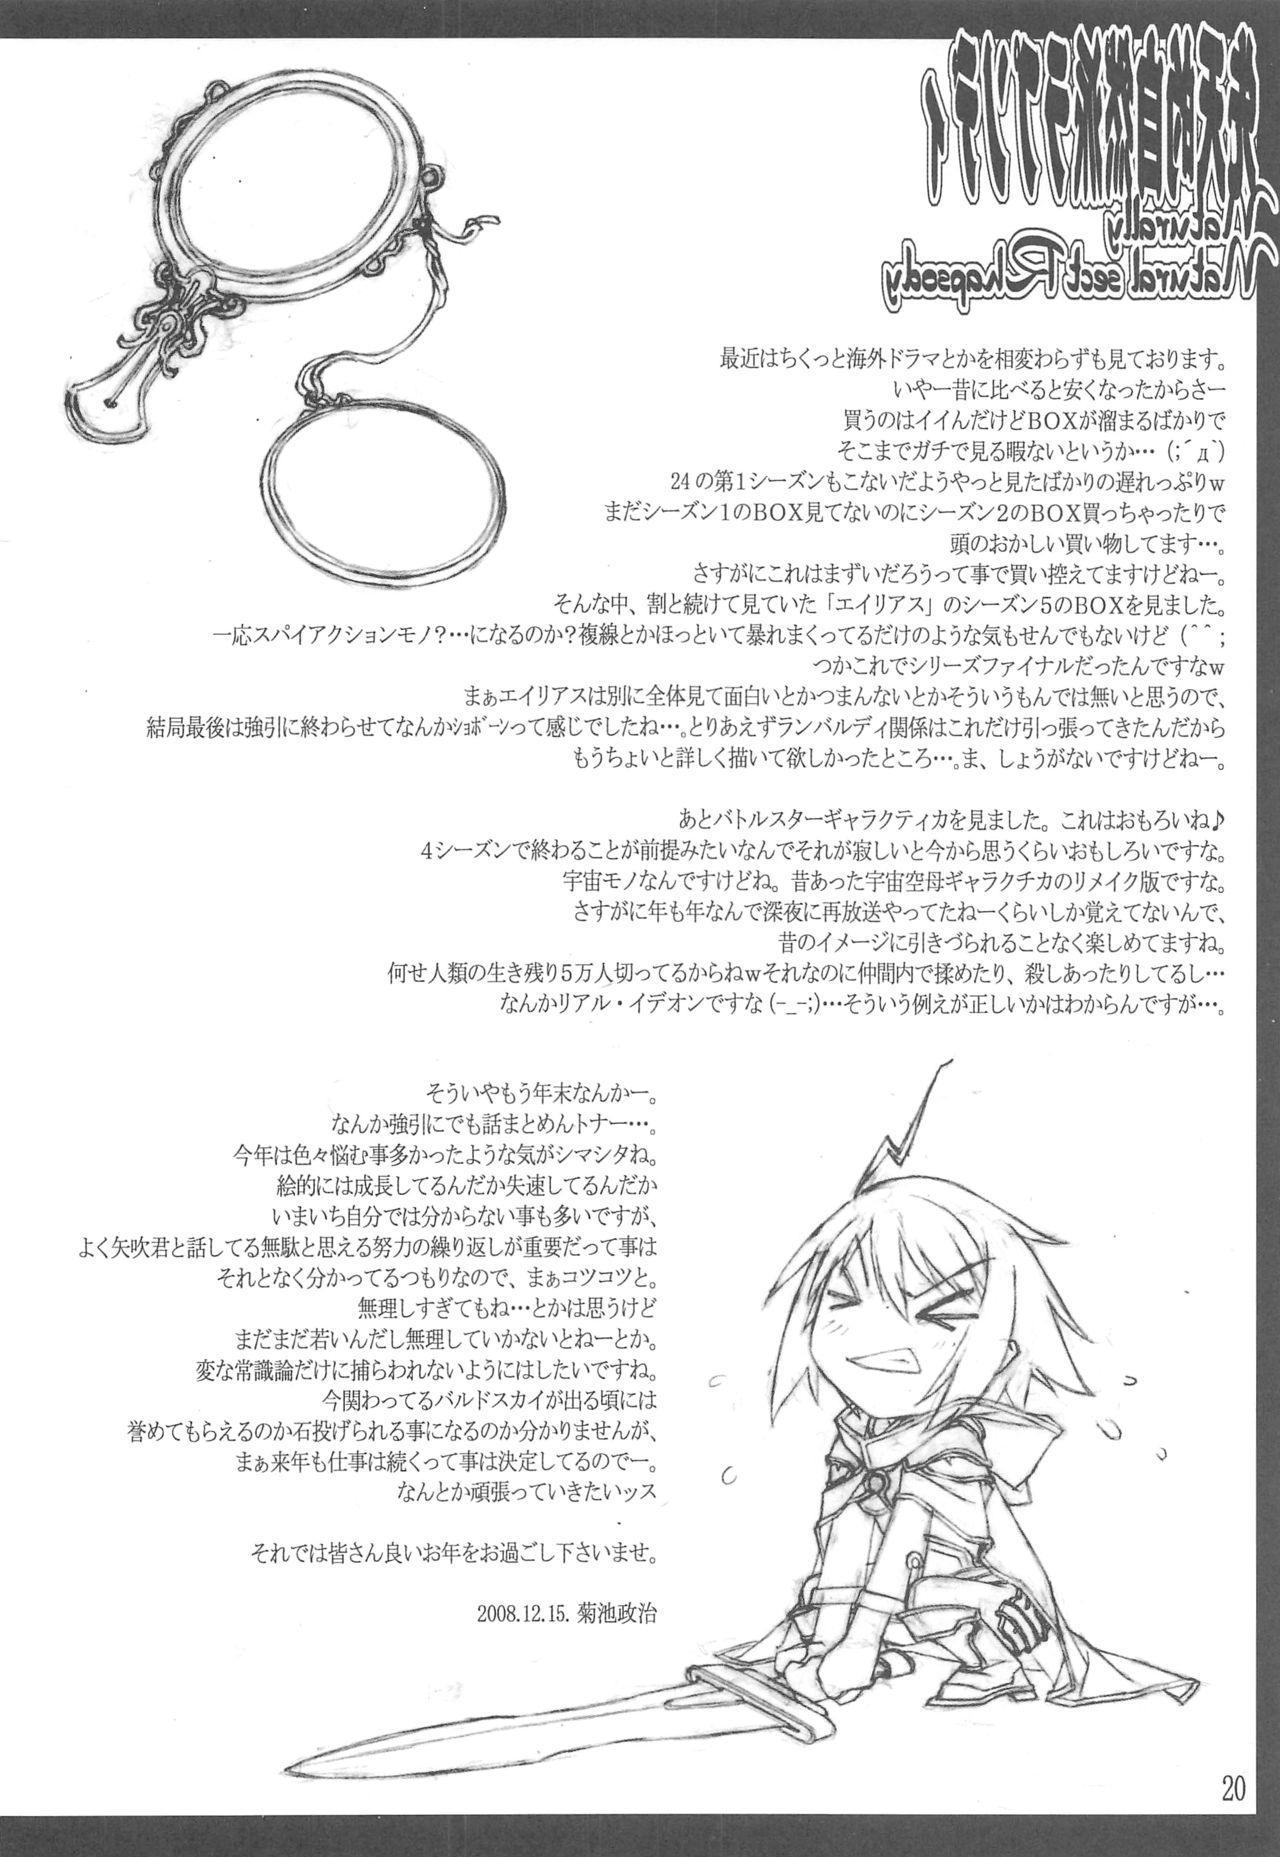 Sententeki Shizenha Rhapsody 20